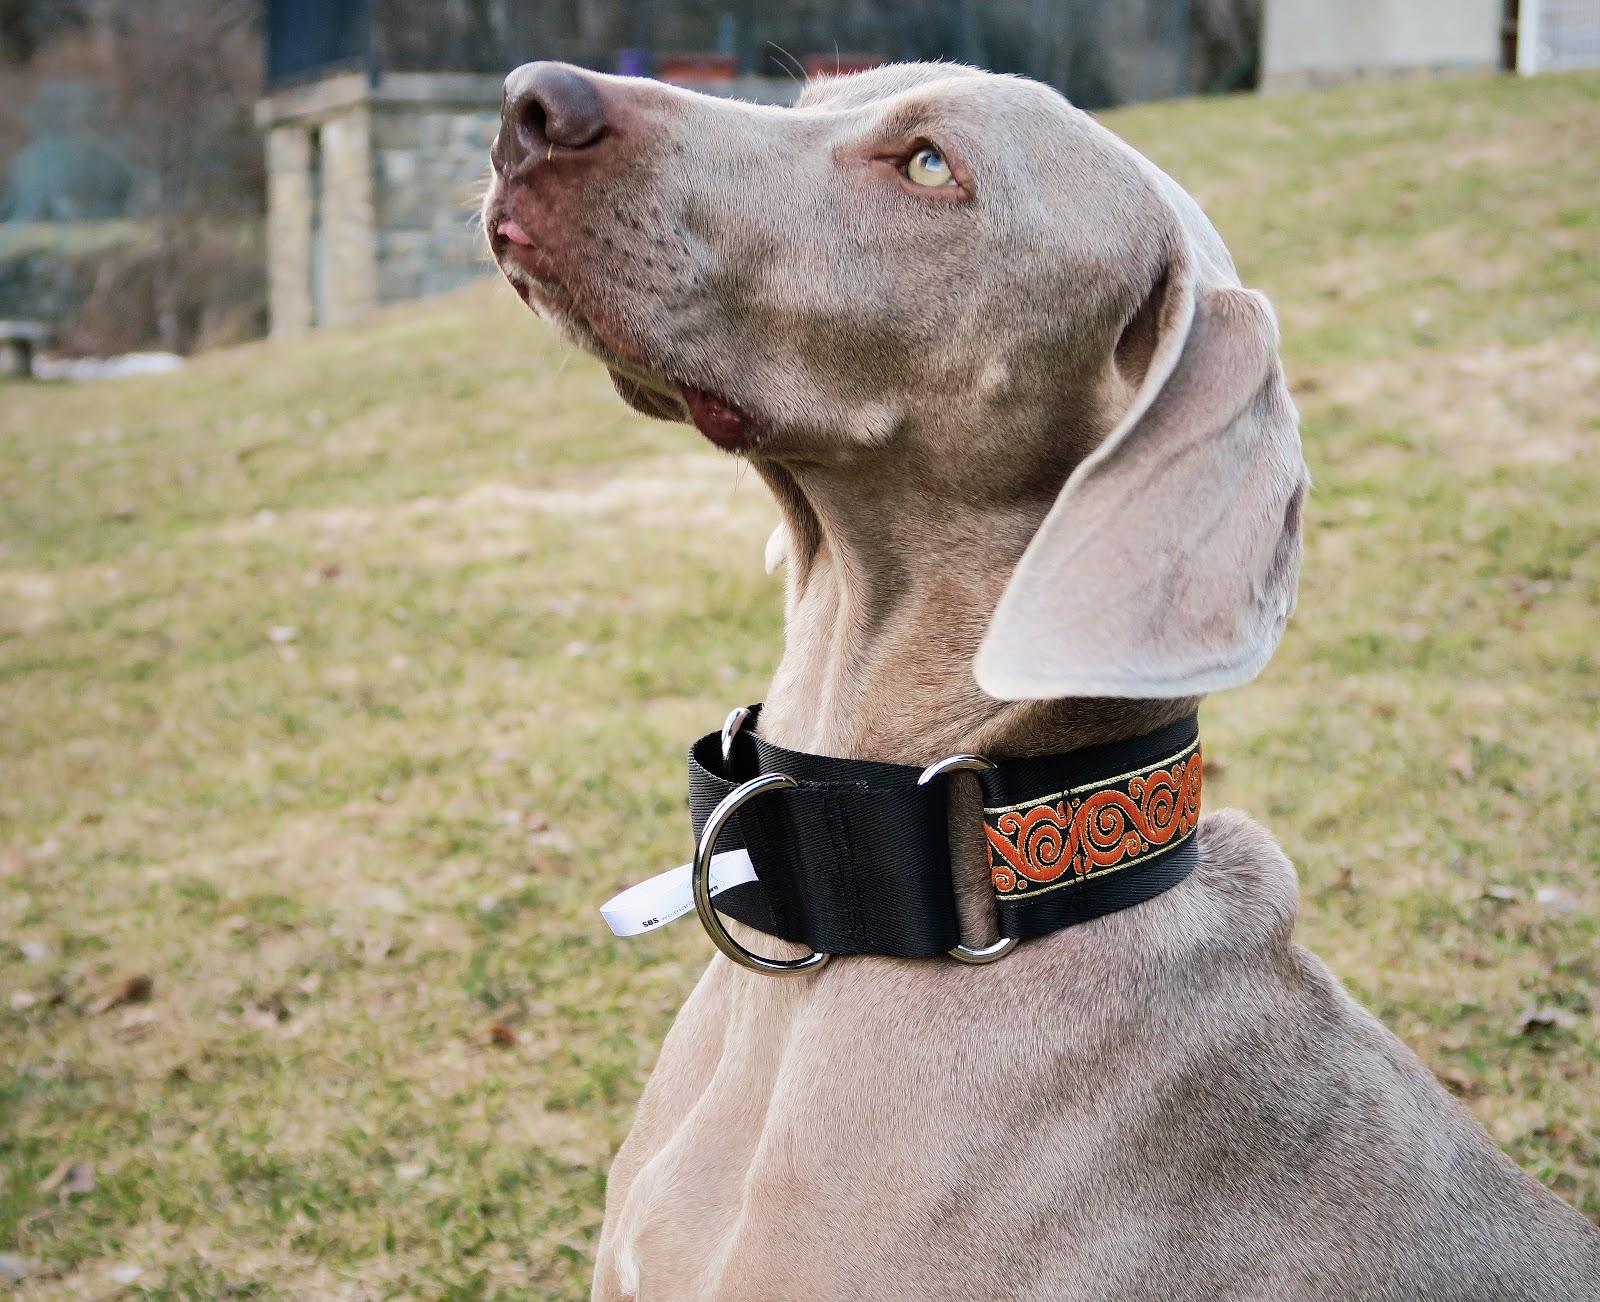 La meteo que viene sos weimaraner collares para perros for Collares para perros